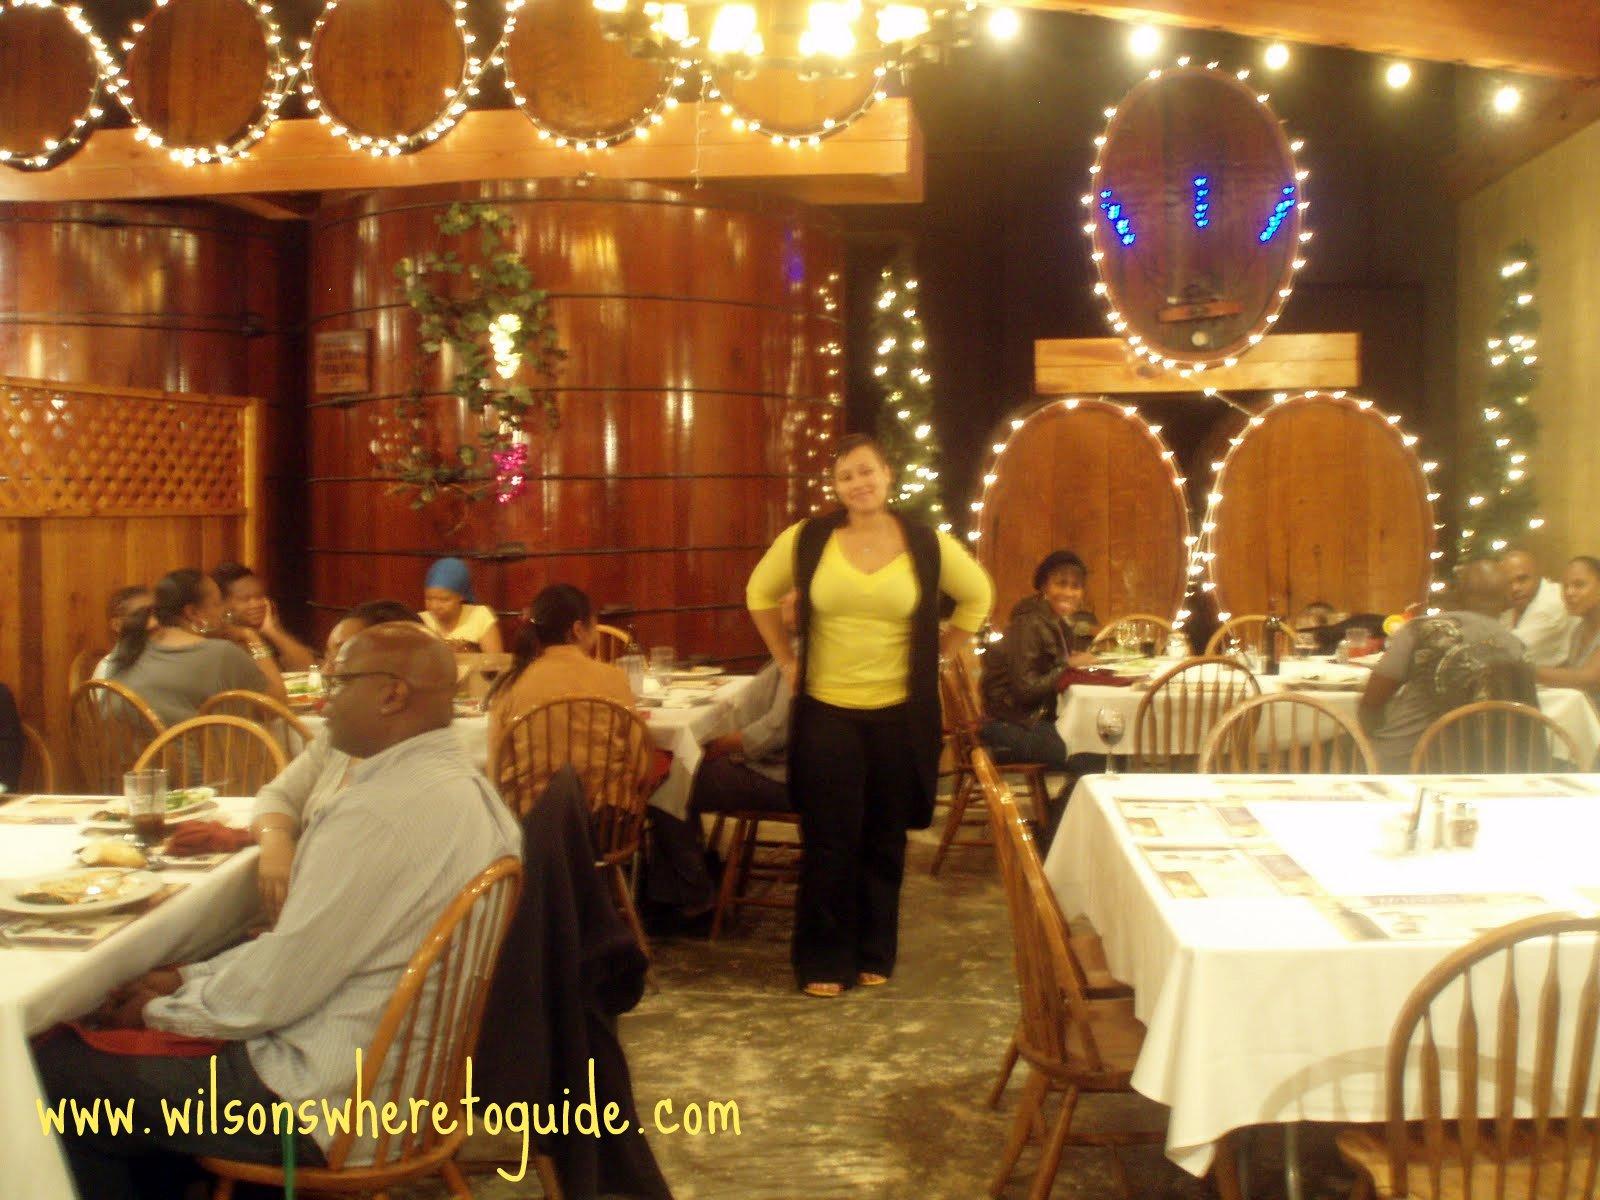 San Antonio Winery 737 Lamar St Los Angeles Ca 90031 323 223 1401 Www Sanantoniowinery